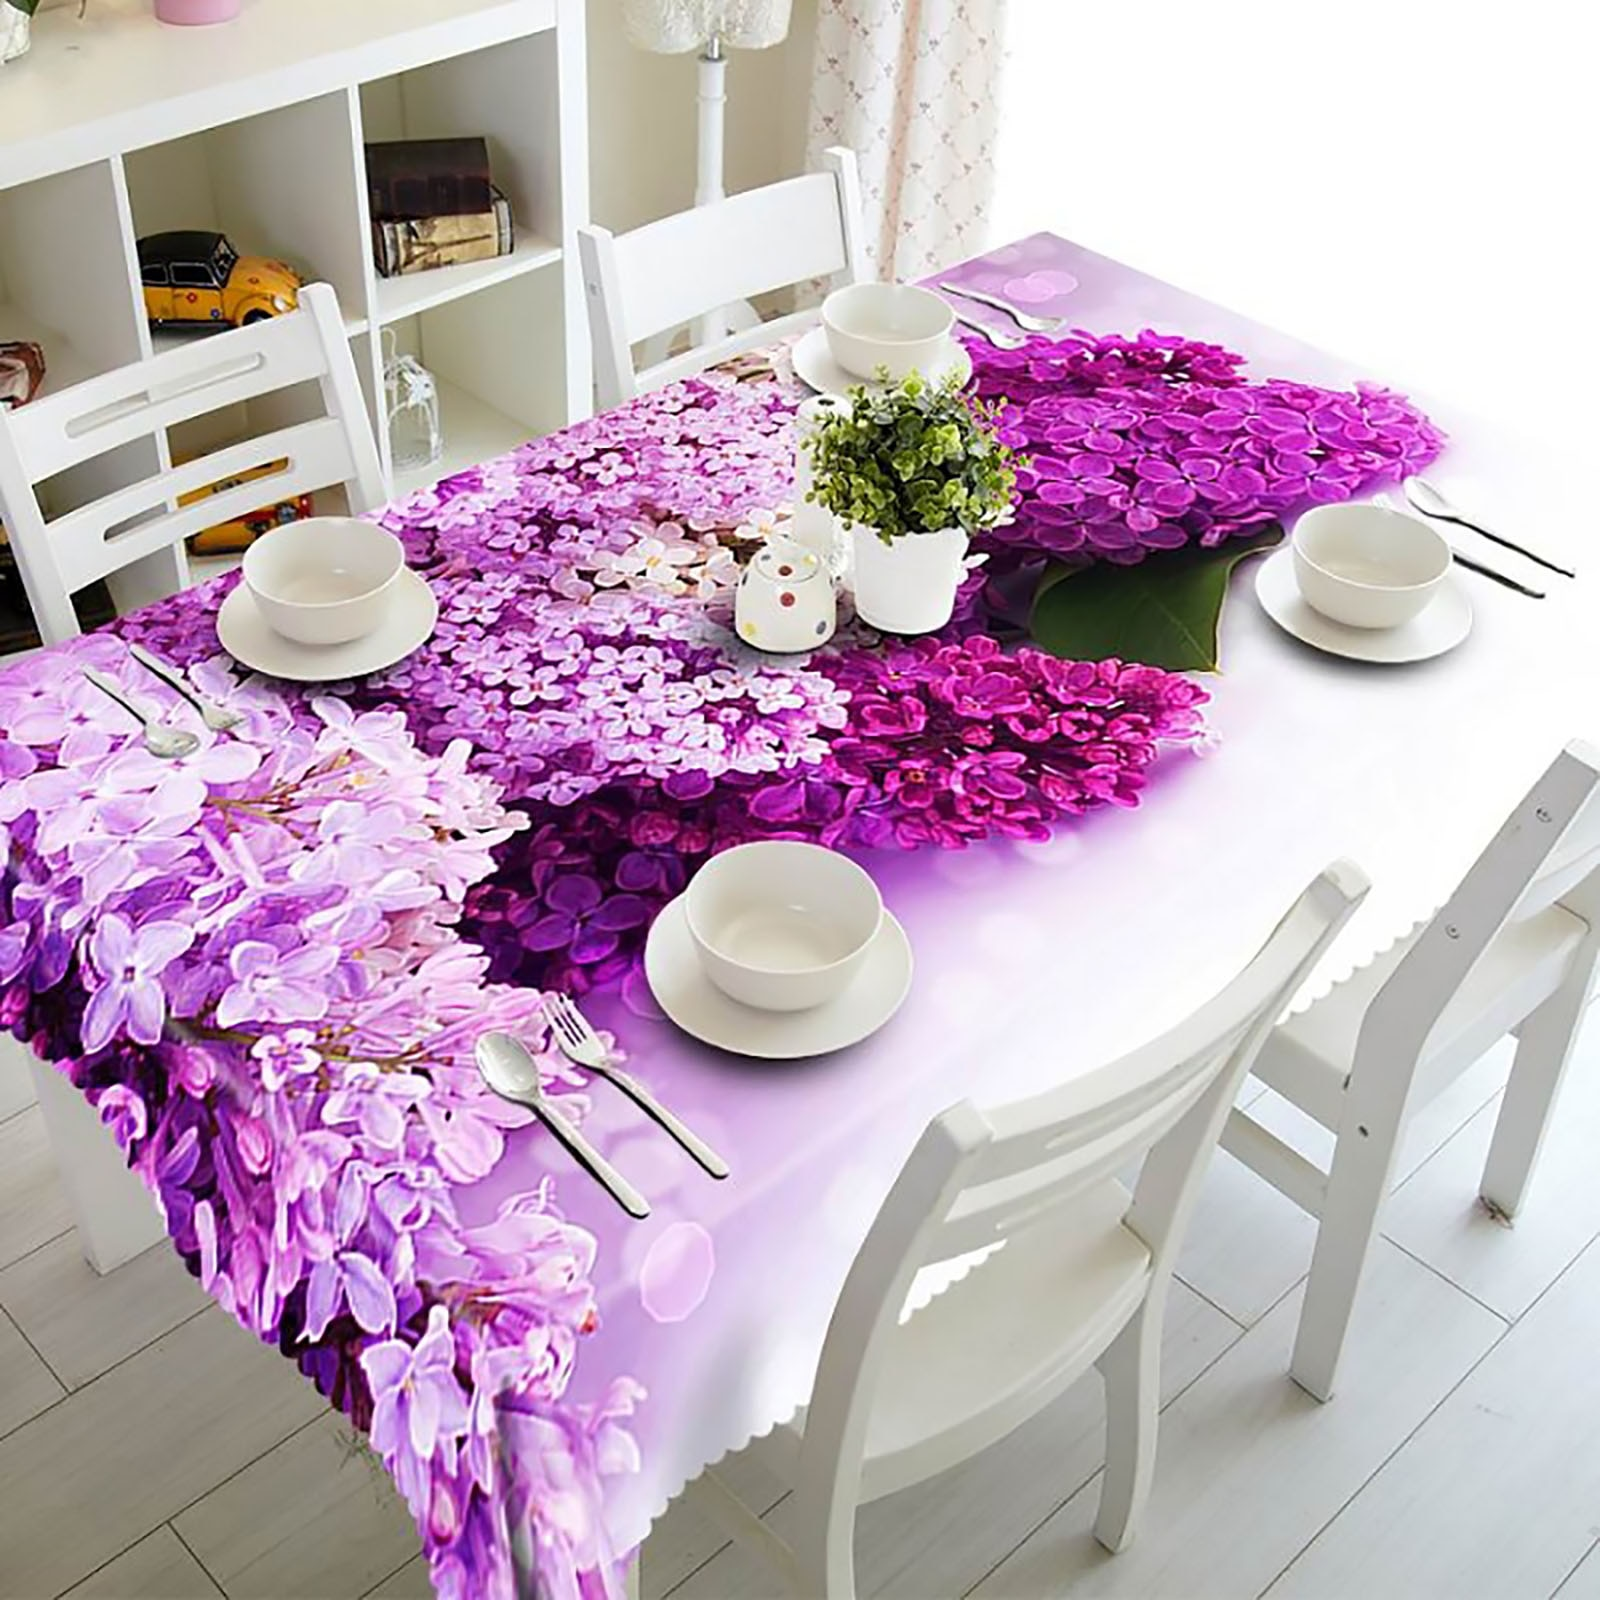 3d pano de mesa decoração de casa casamento rosa flor capa de mesa feliz natal festa jantar decoração capa de mesa